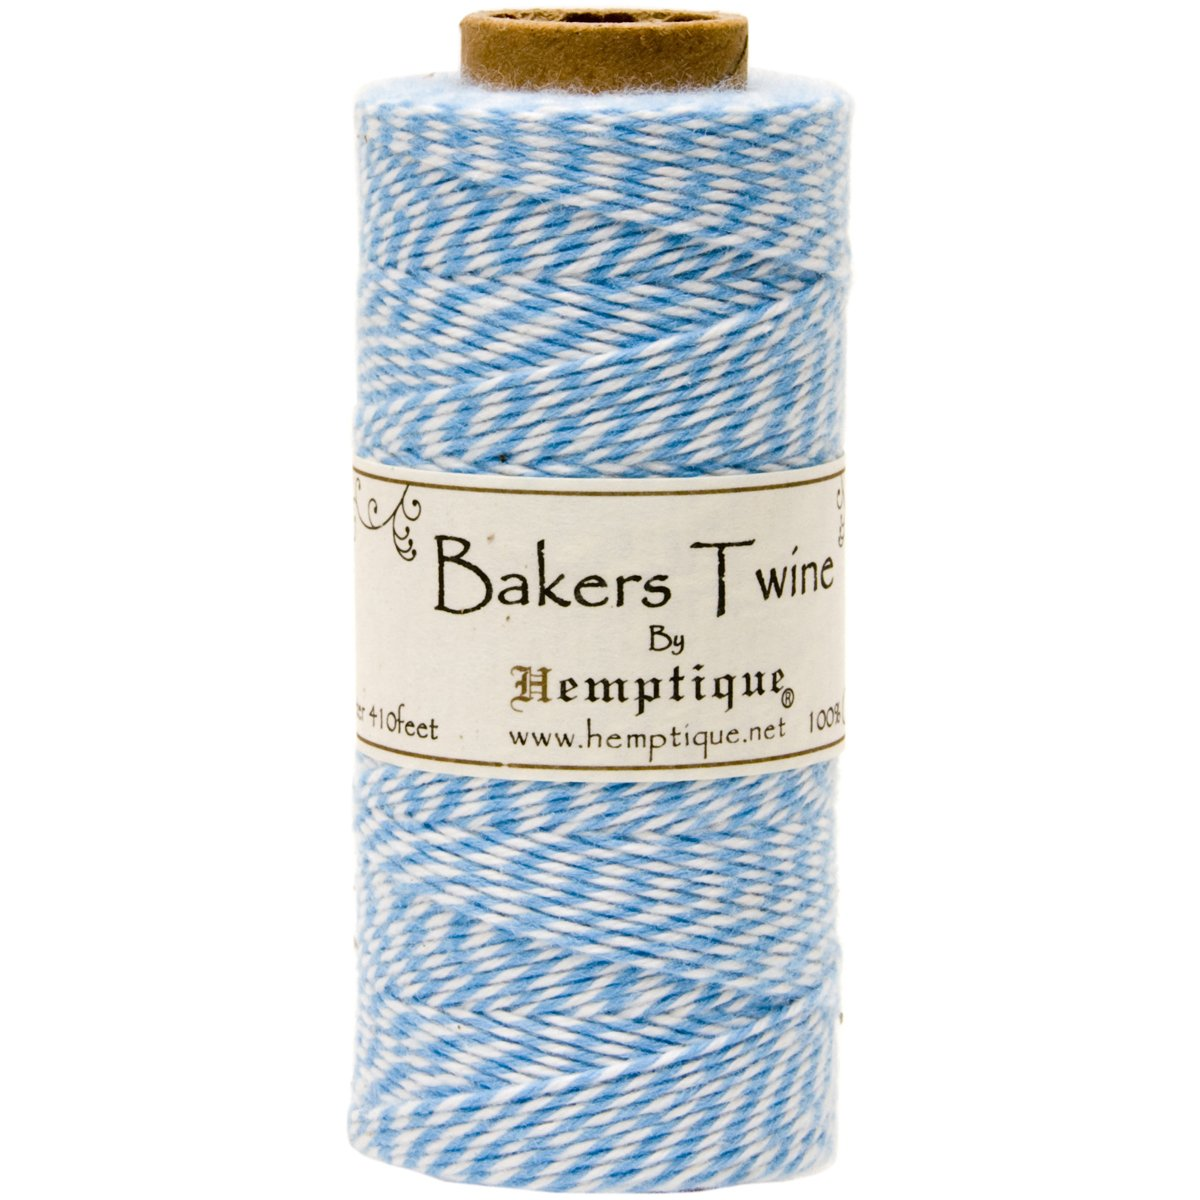 410-Feet Black Pack of 2 Hemptique Cotton Bakers Twine Spool 2 Ply